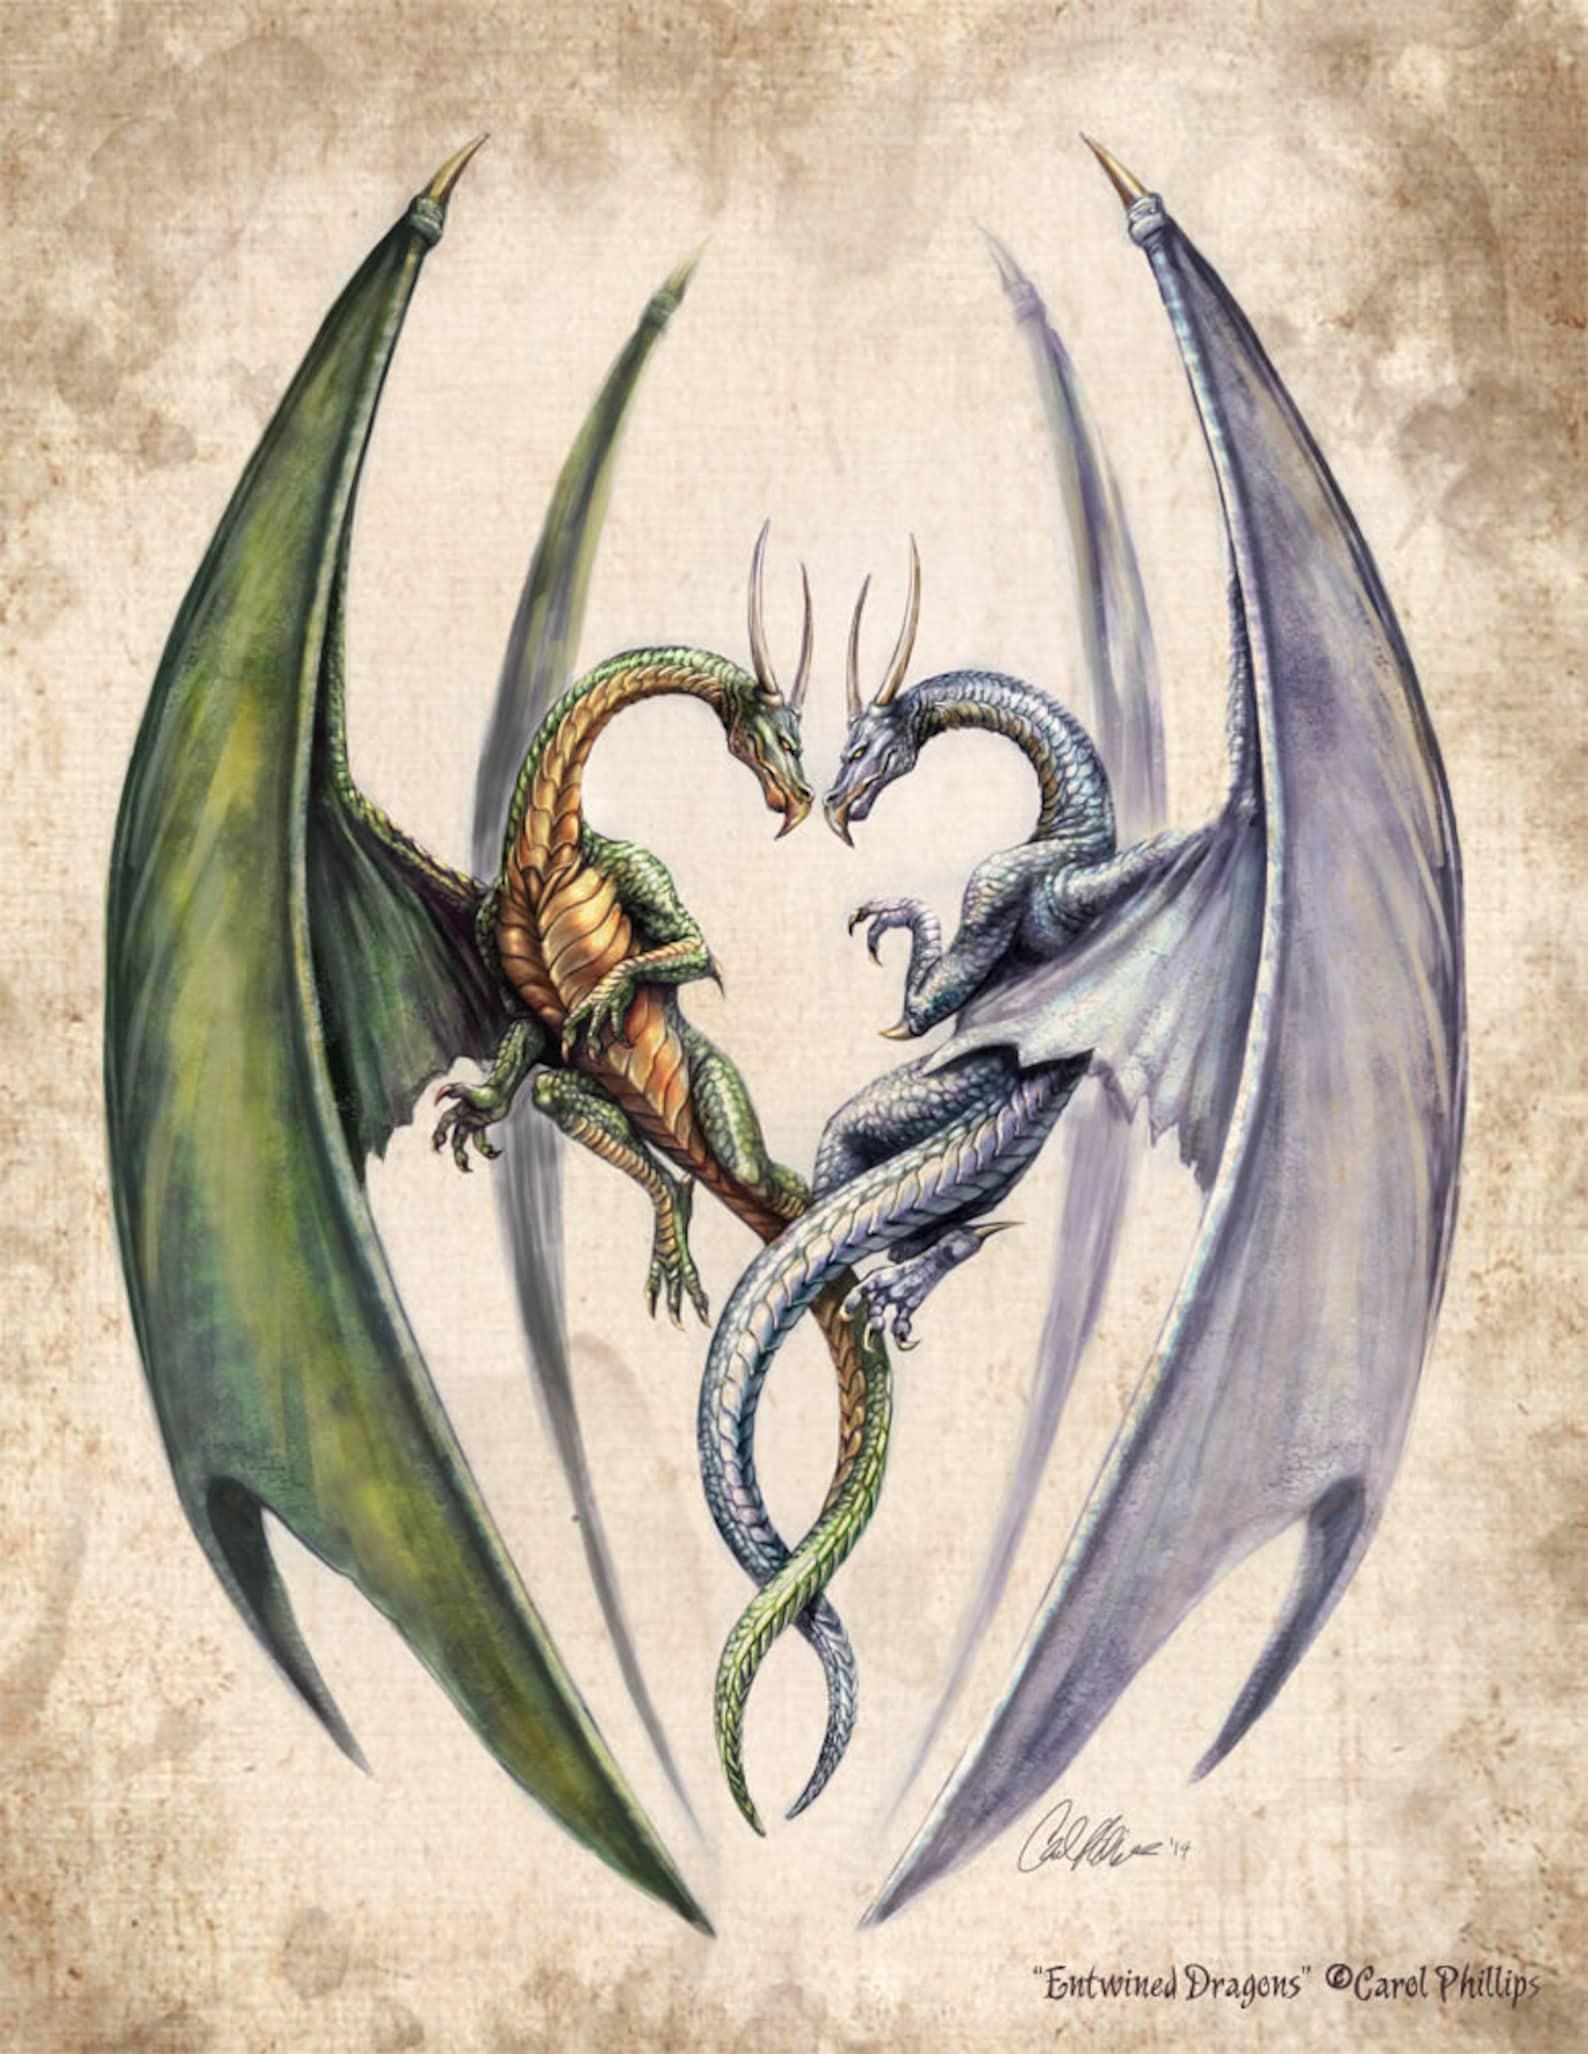 дракон близнец картинка образом